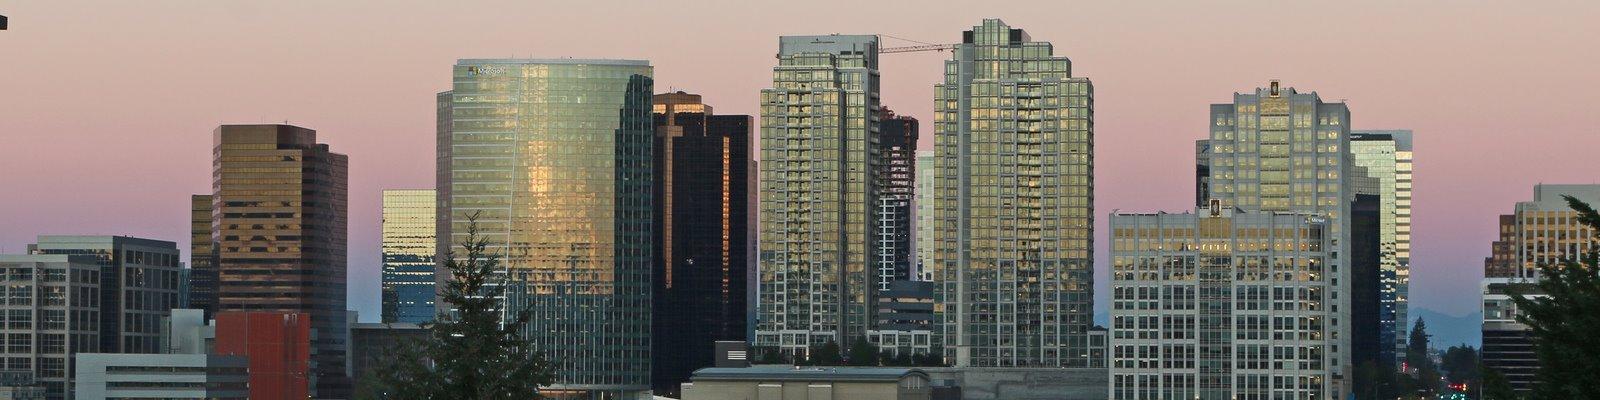 Bellevue Property Taxes | City of Bellevue